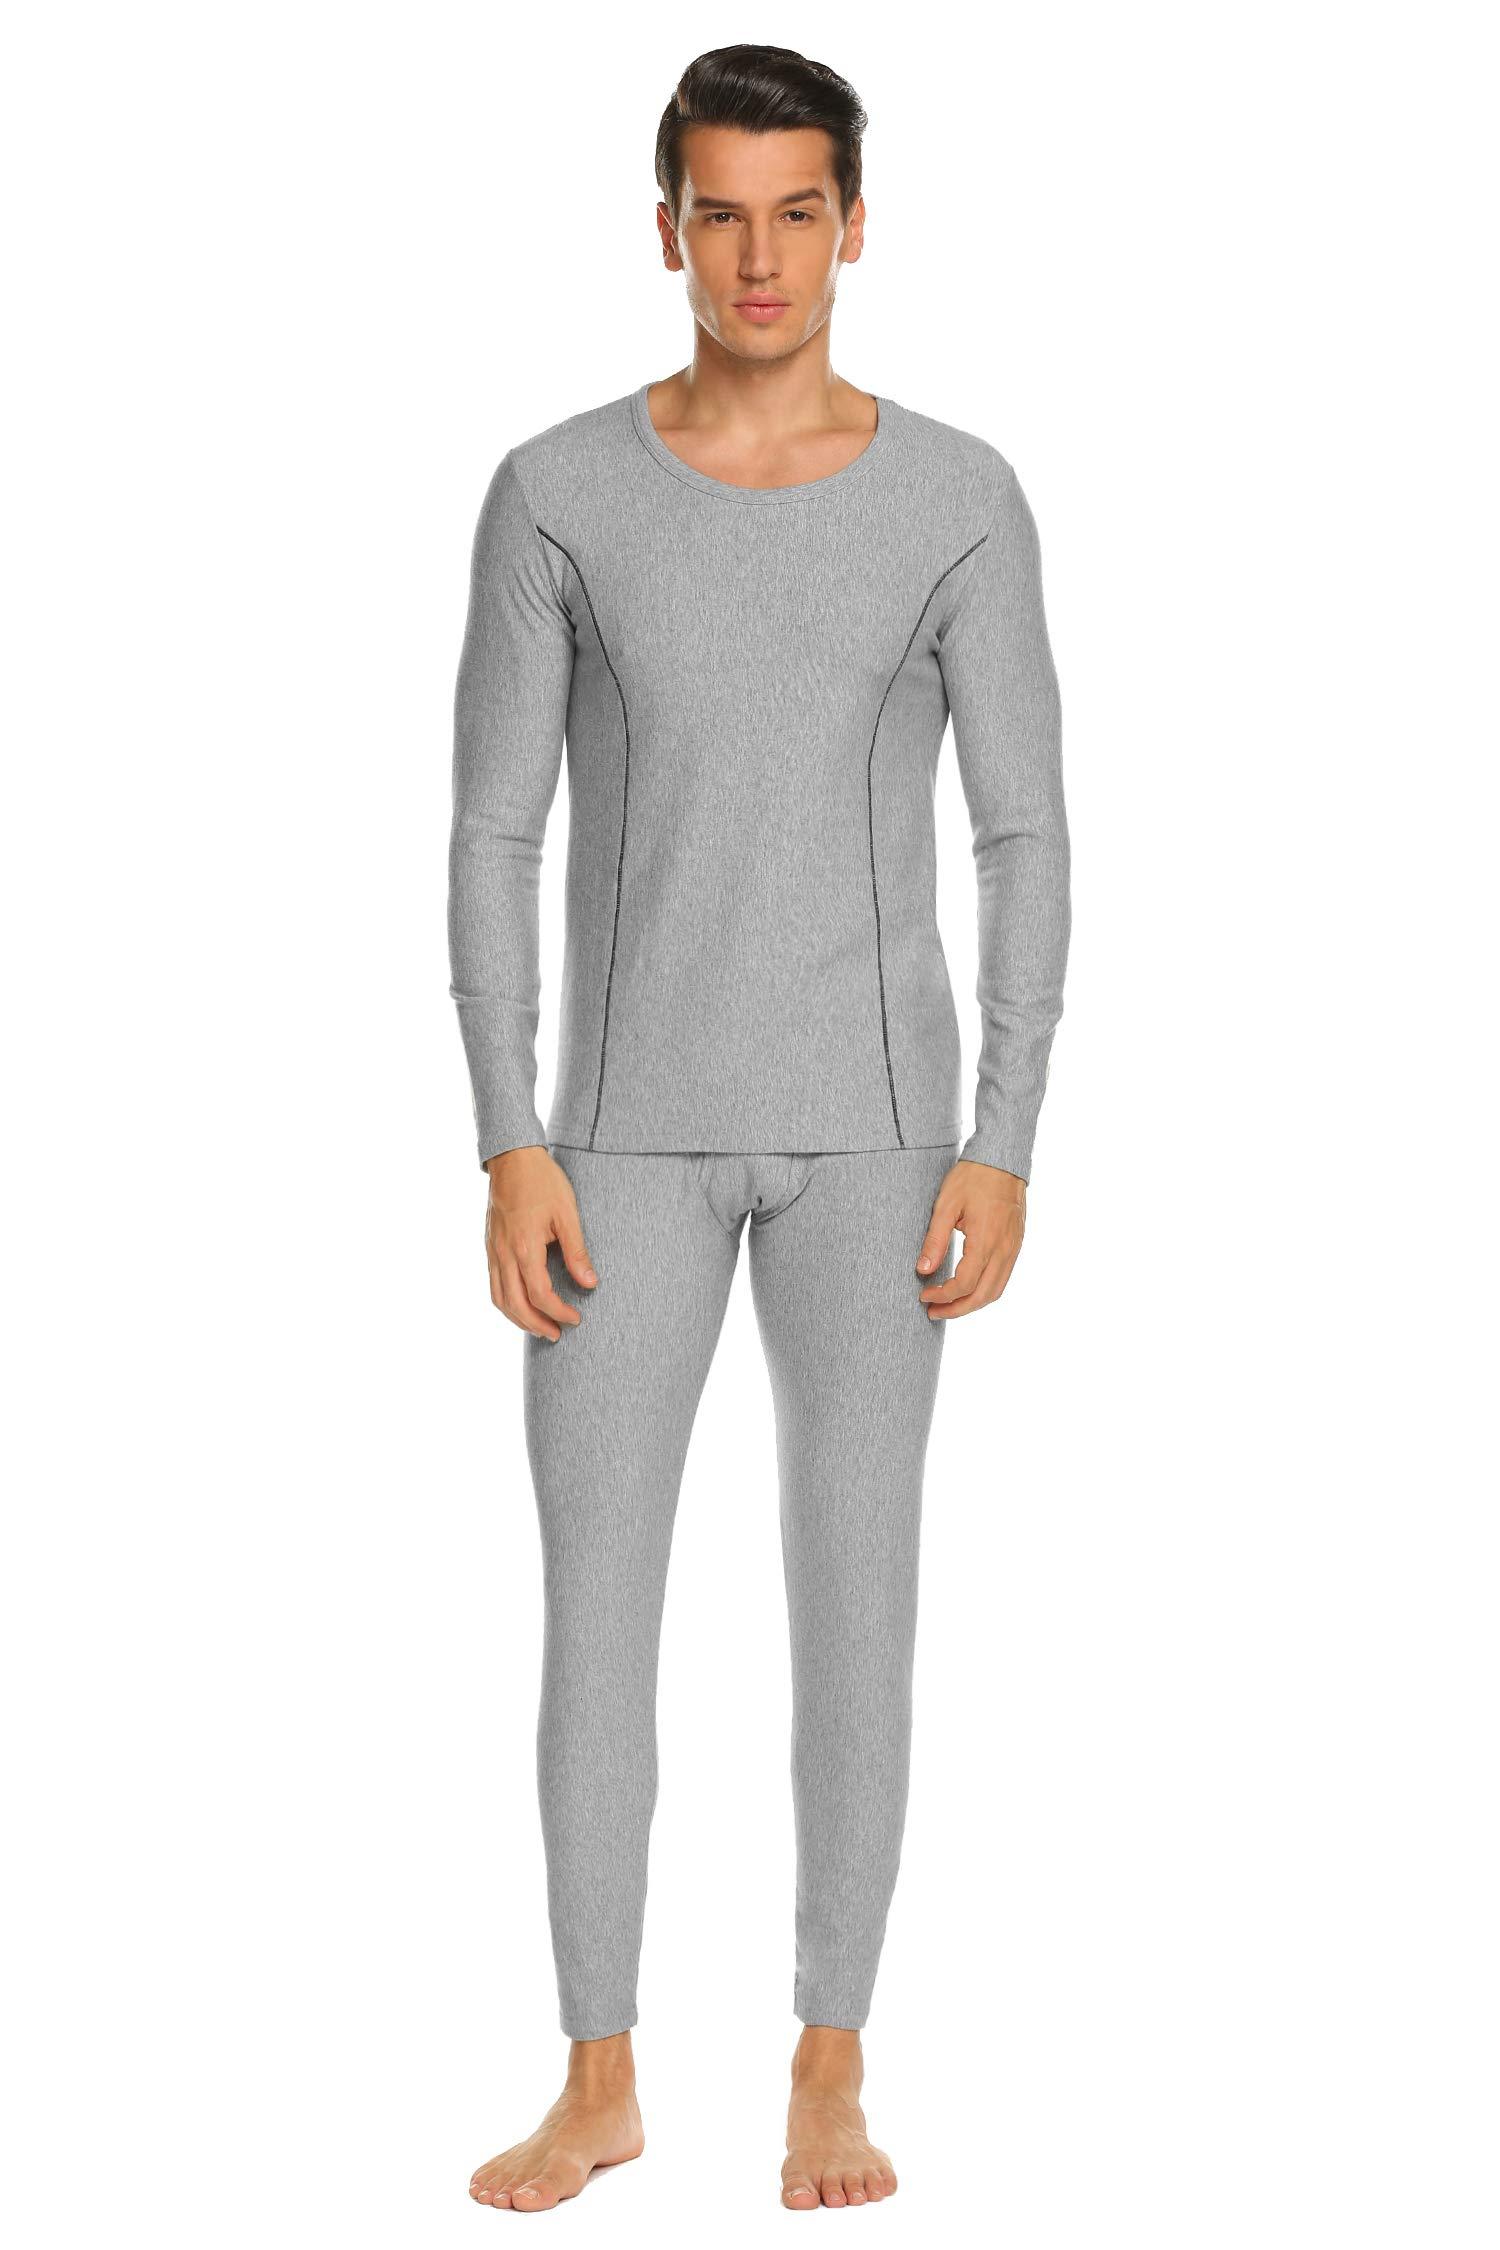 Ekouaer Long Johns for Men, Soft Cotton Shirt/Pants 2PC Lightweight Thermal Set